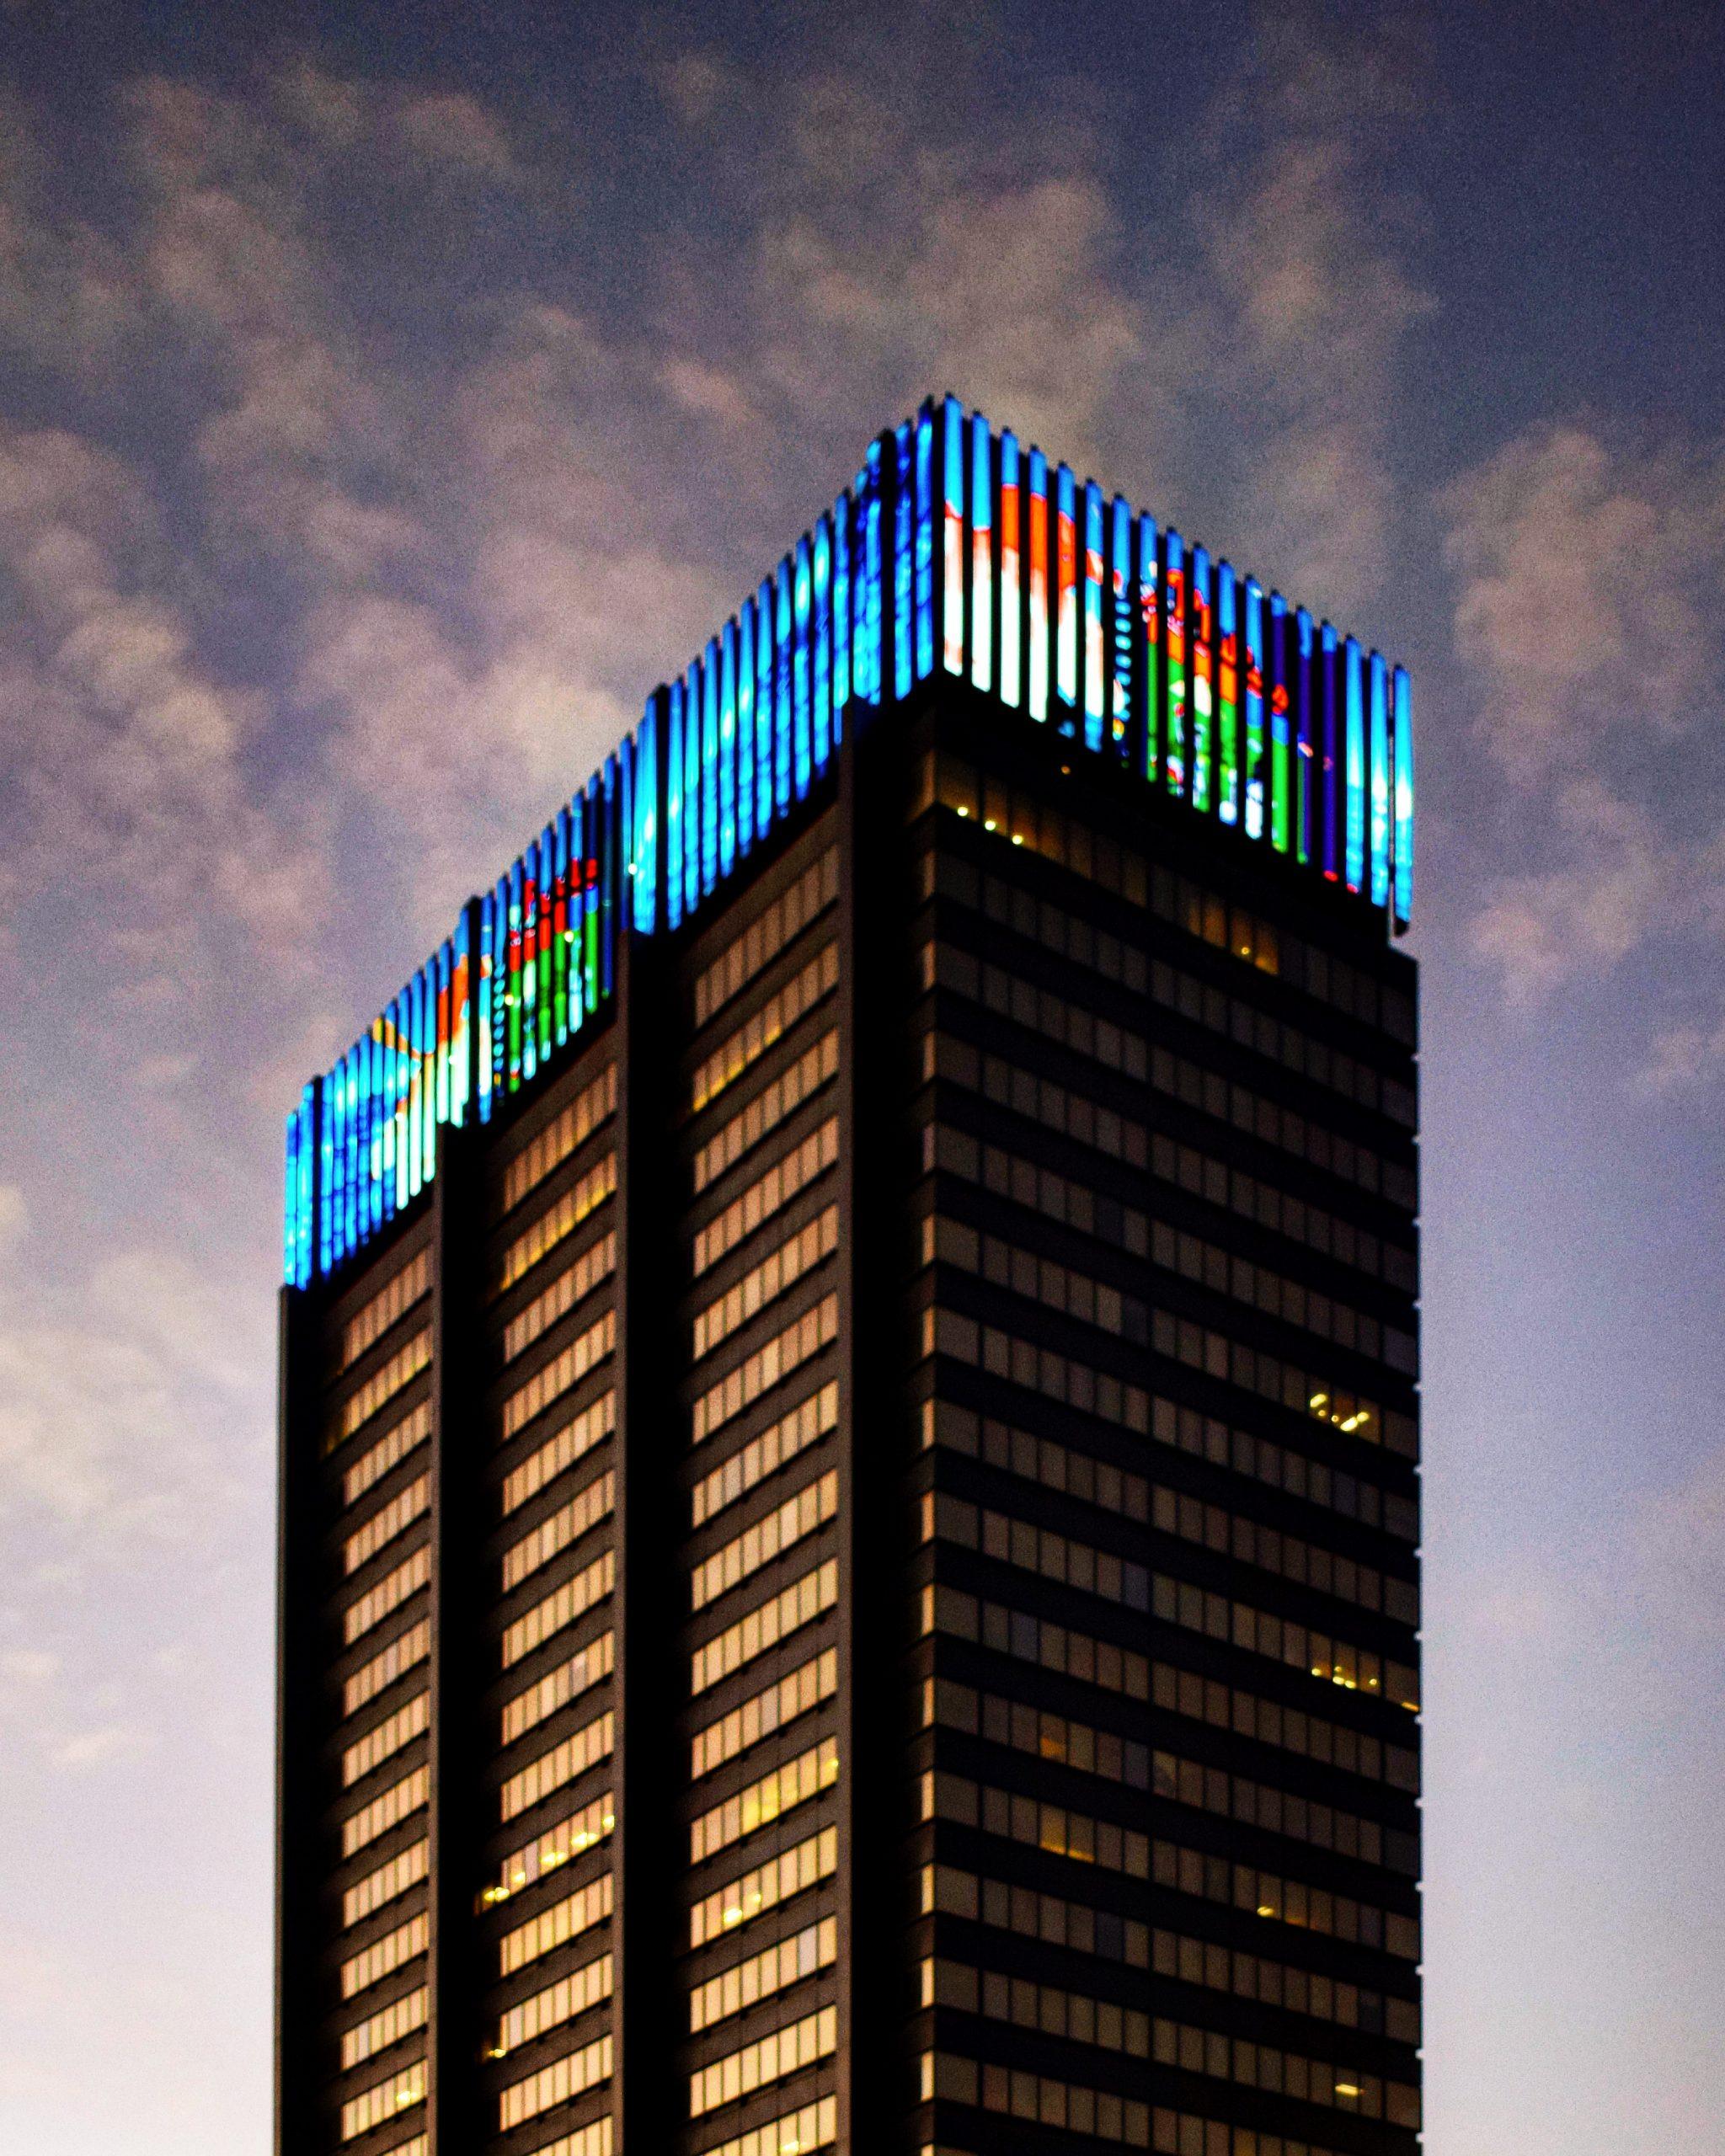 PECO Building with the new display. Photo by Thomas Koloski